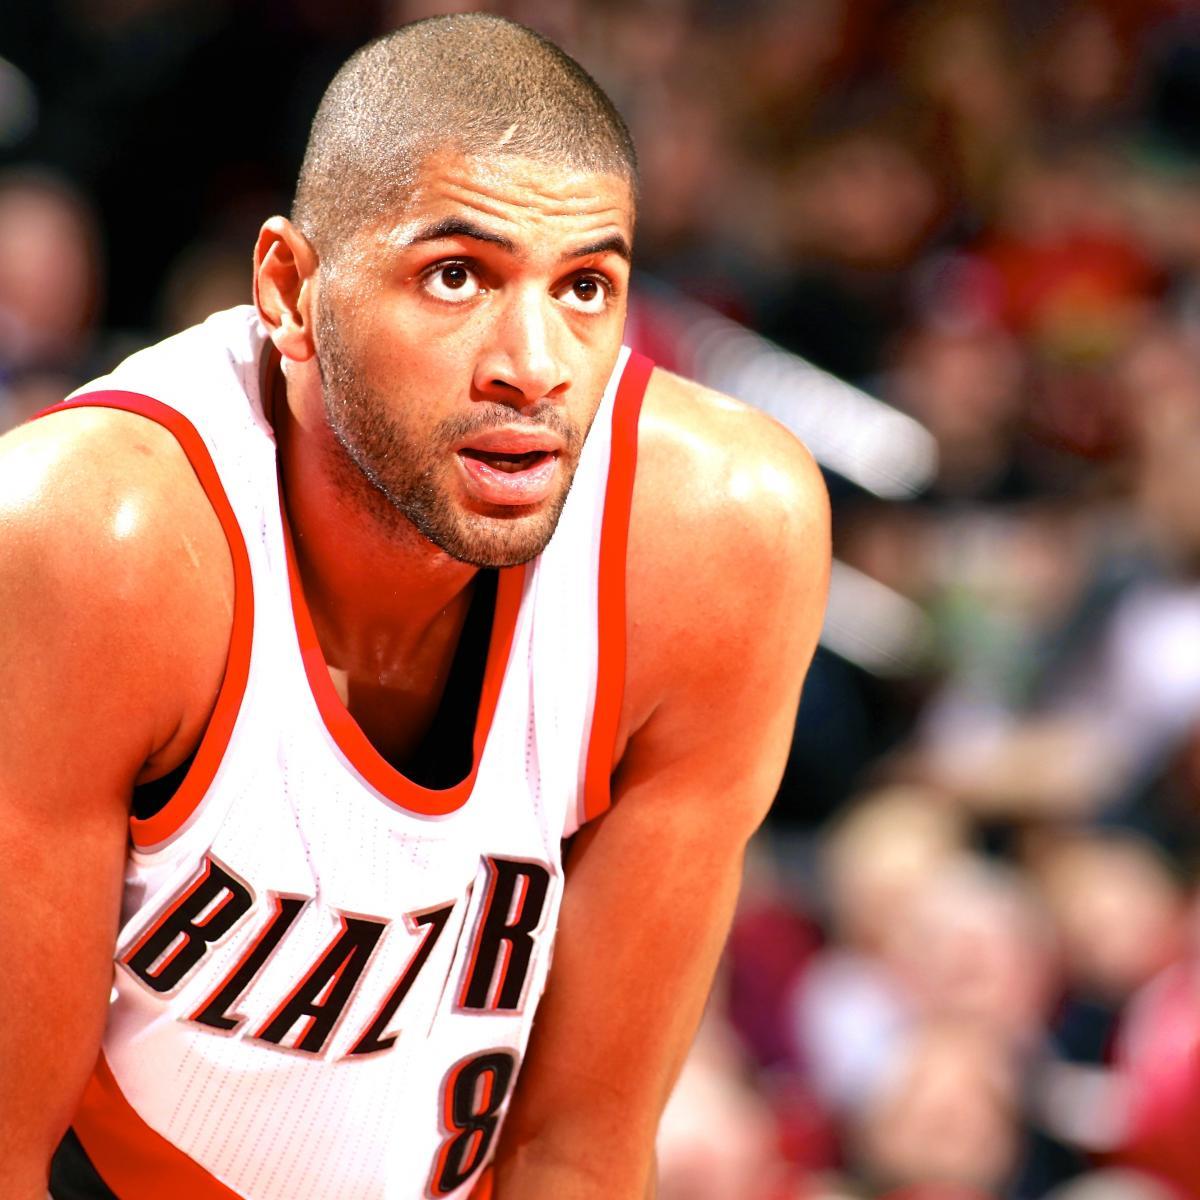 Portland Trail Blazers Injury News: Nicolas Batum Injury: Updates On Trail Blazers Star's Knee